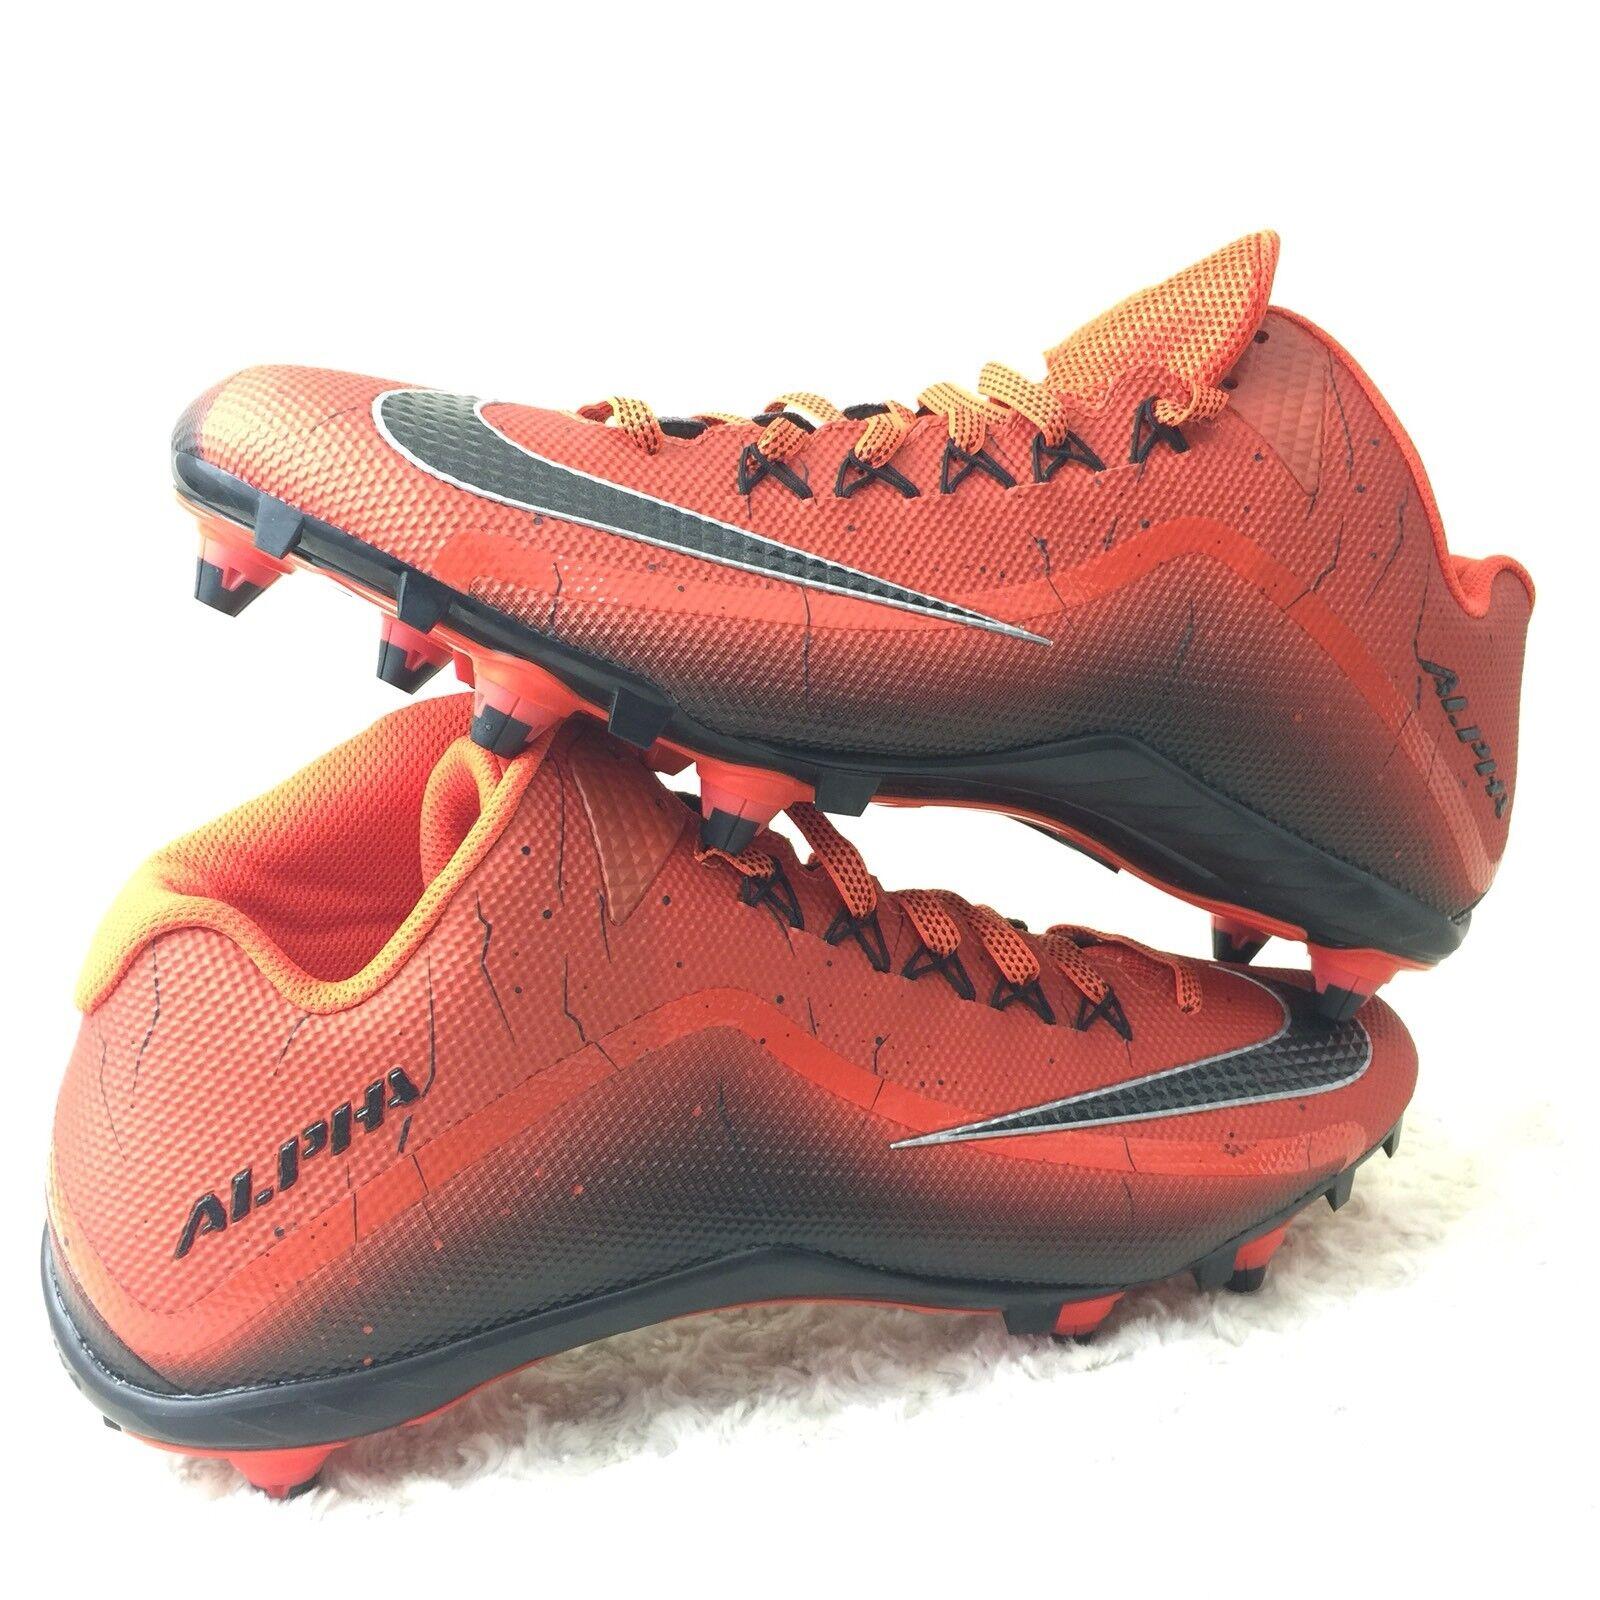 Nike Alpha Pro 2D Skin football Cleats Men Sz 16 US Shoes Orange 705409-800 New Cheap women's shoes women's shoes